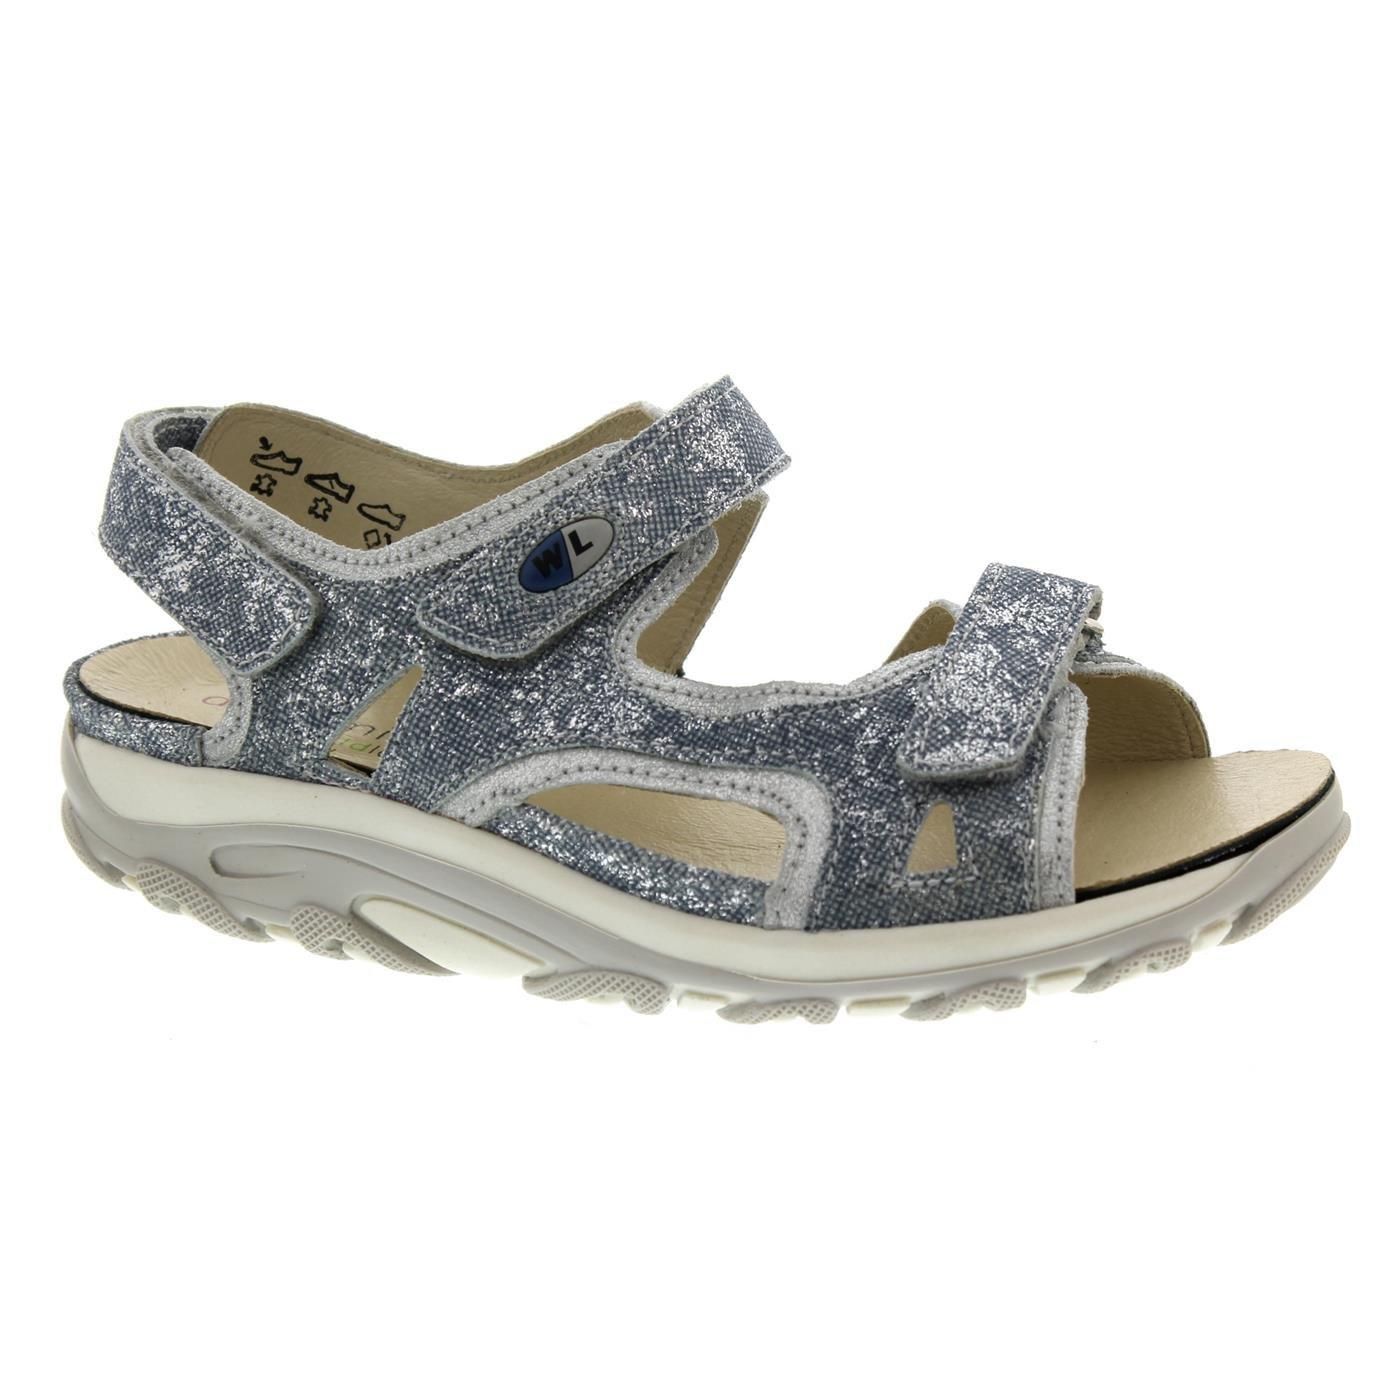 Waldläufer Hanni, Dynamic-Sohle, Newton/Glitter, Jeans/Silber Weite H 448002-206-693 Jeans-Silber